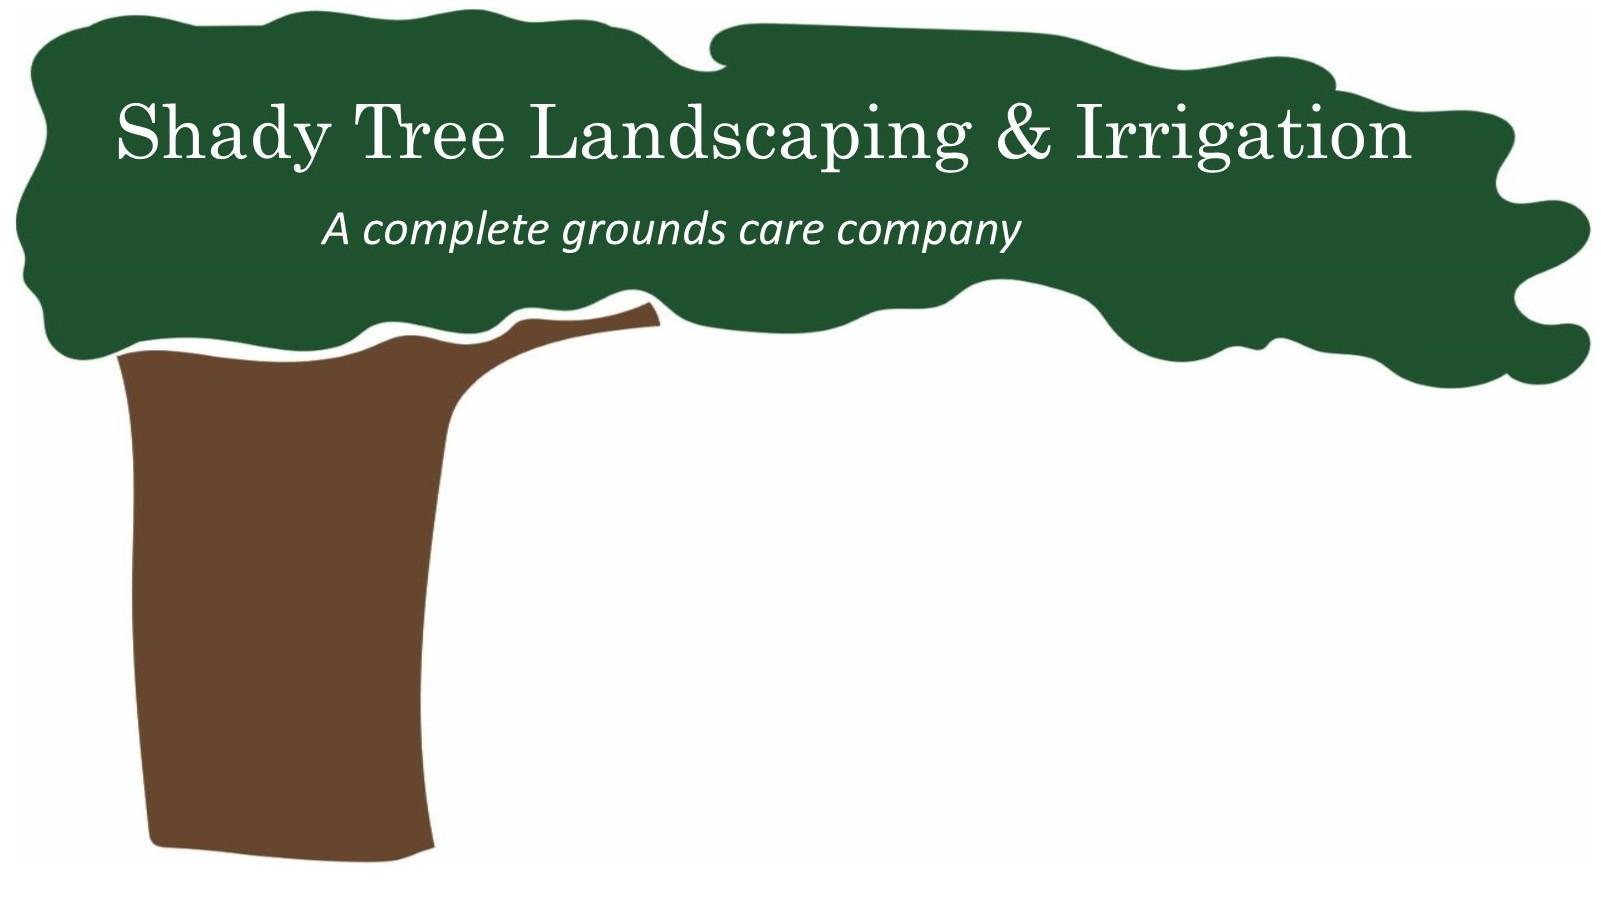 Shady-Tree-Landscaping-&-Irrigation.jpg